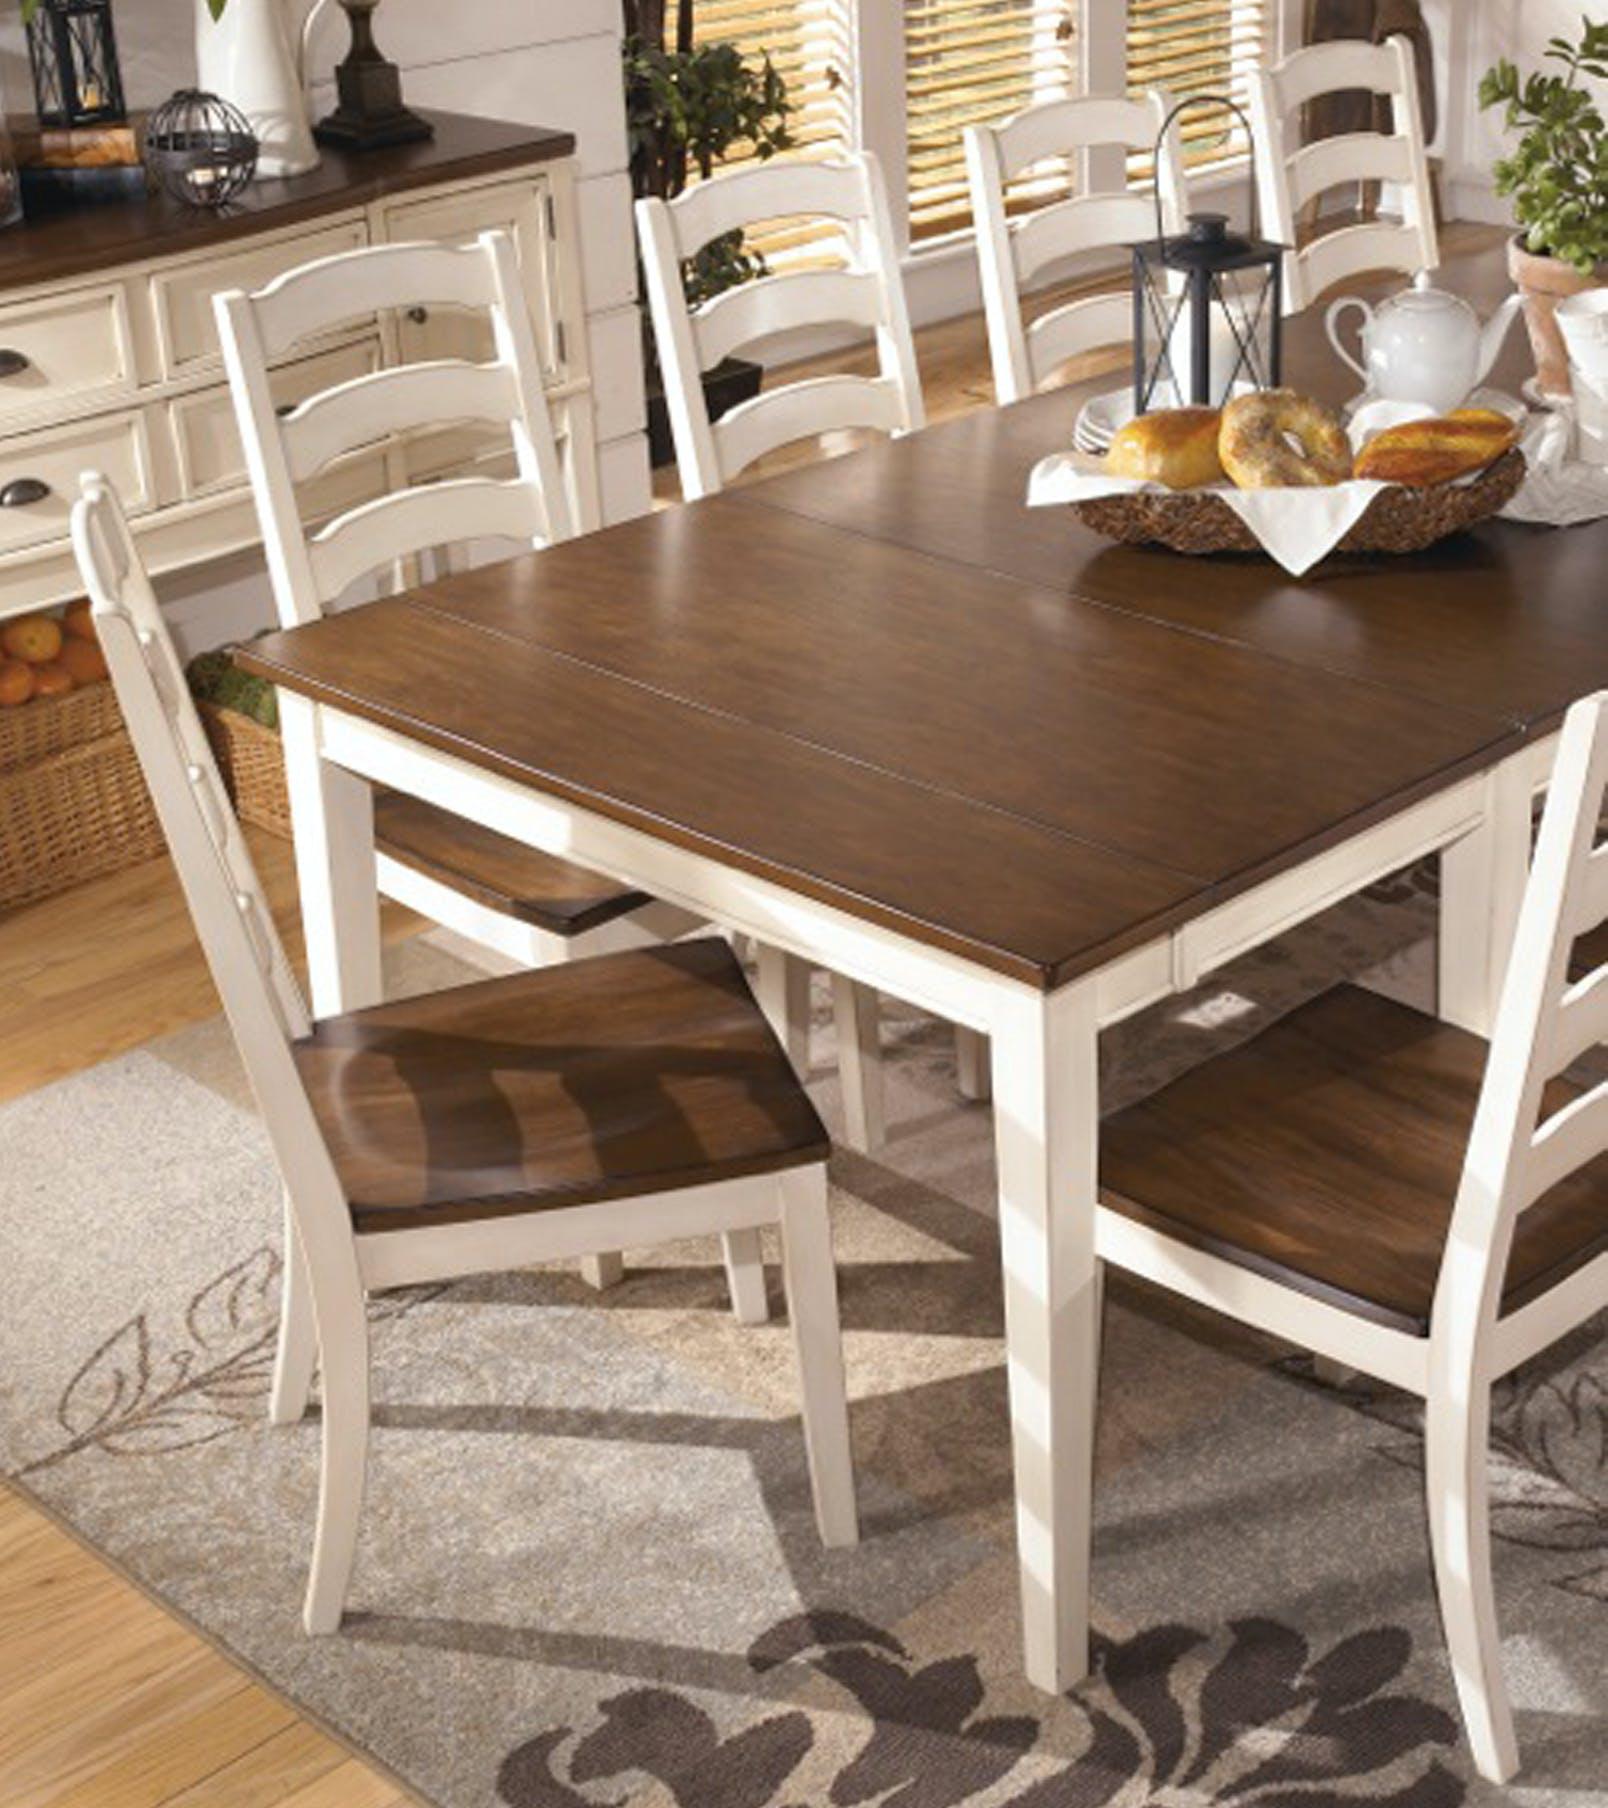 Dining Room Furniture Shops: Furniture Store And Mattress Retailer In Saginaw, MI